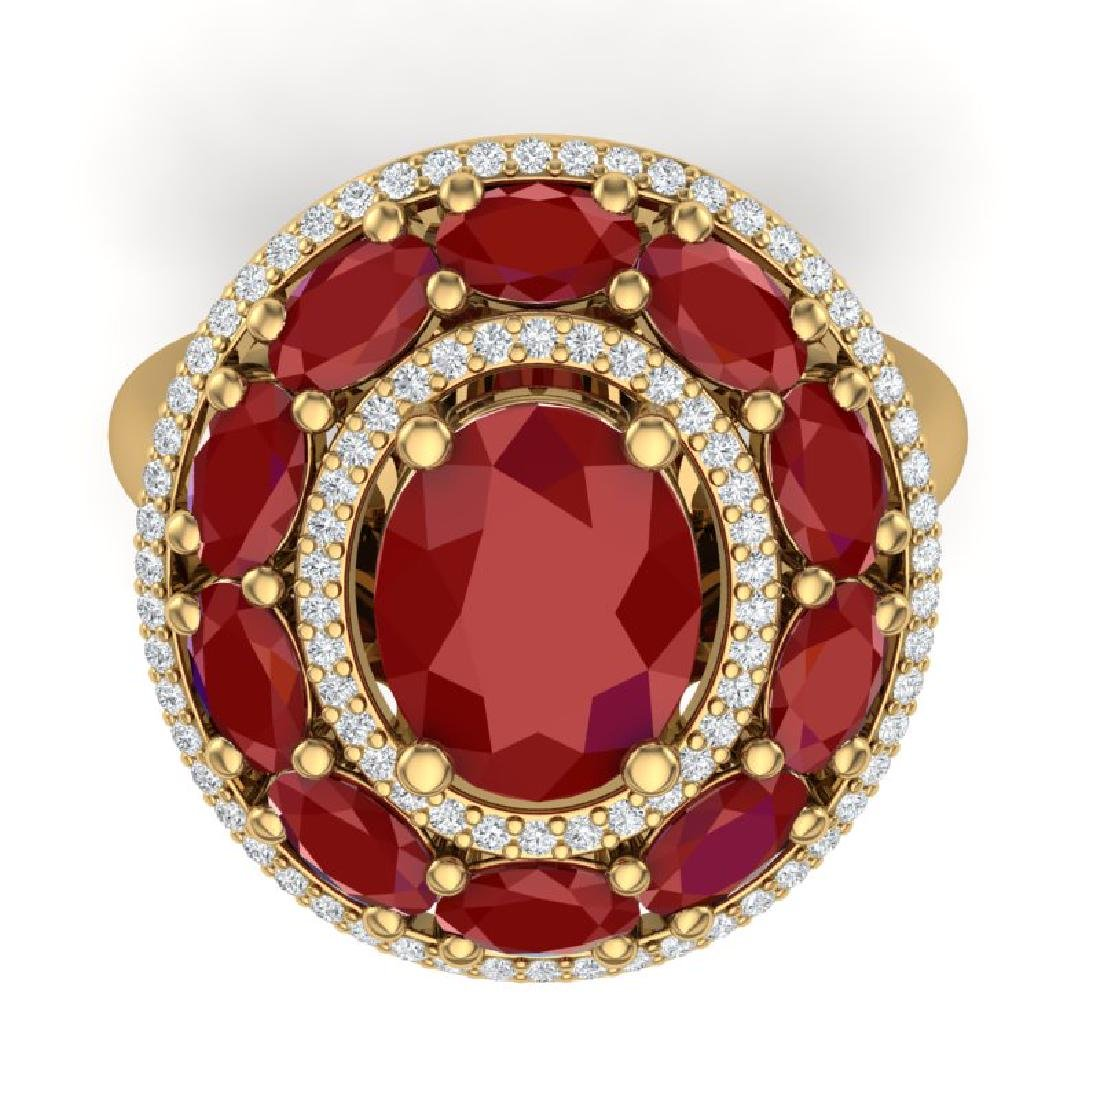 8.05 CTW Royalty Designer Ruby & VS Diamond Ring 18K - 2